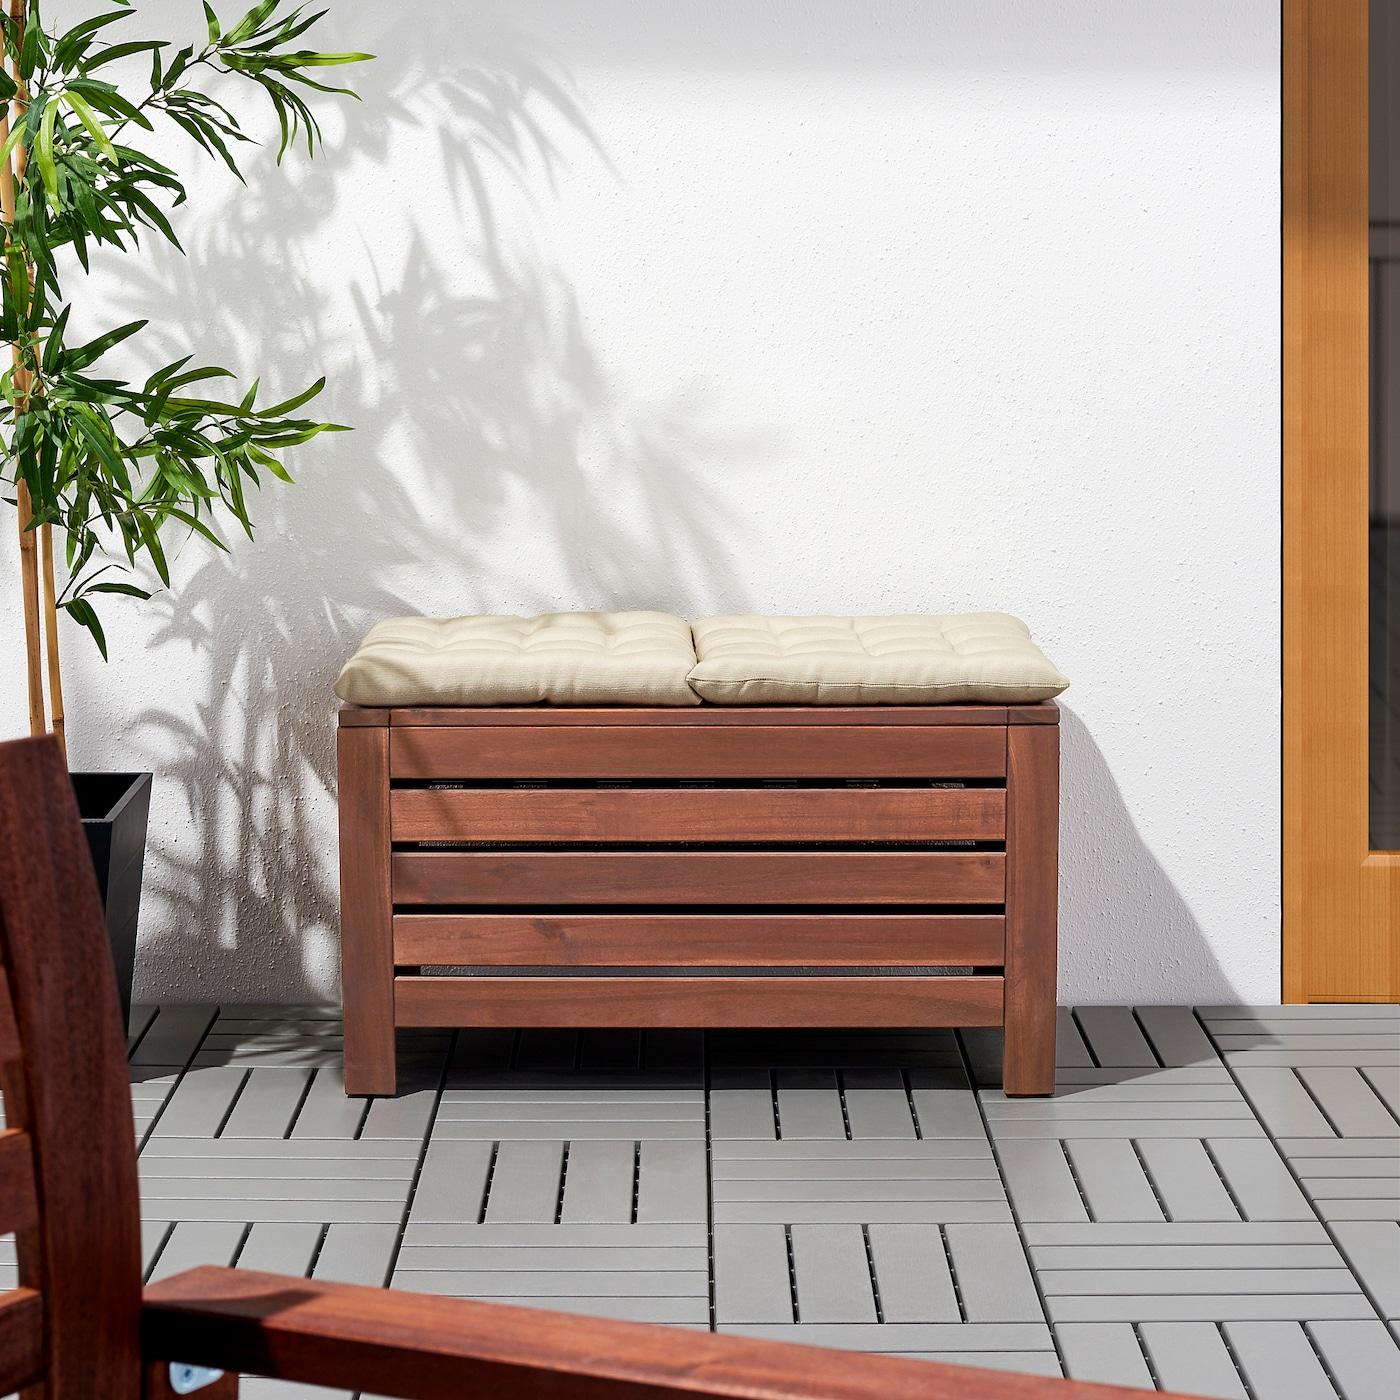 Applaro Storage Bench Outdoor Brown Stained Ikea